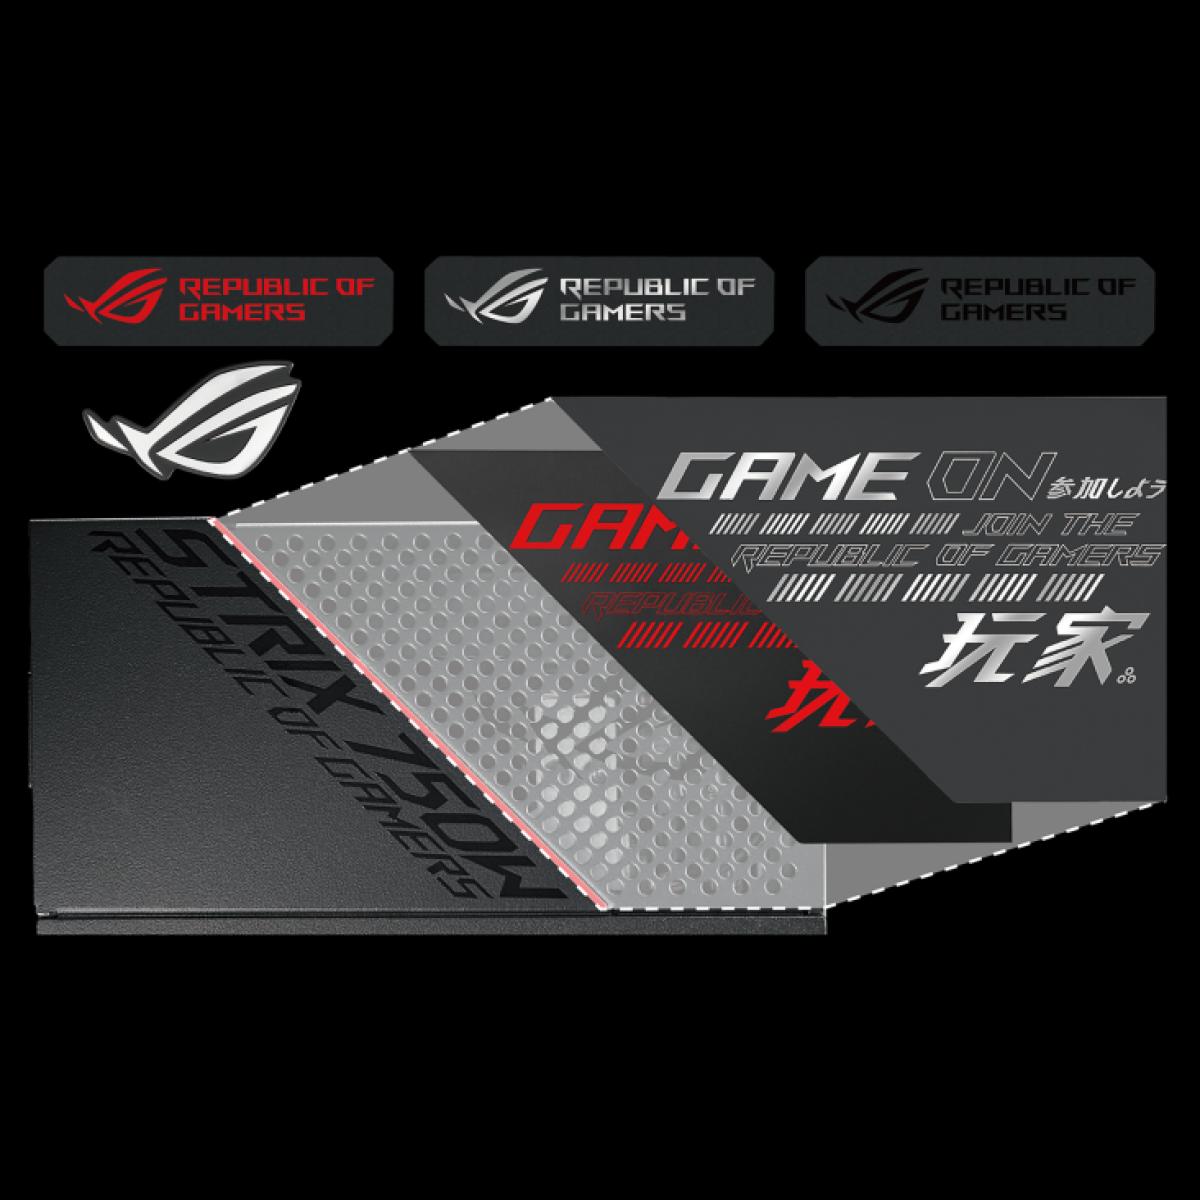 Fonte Asus ROG Strix 650G, 650W, 80 Plus Gold, Full Modular, RSSS03-650G1